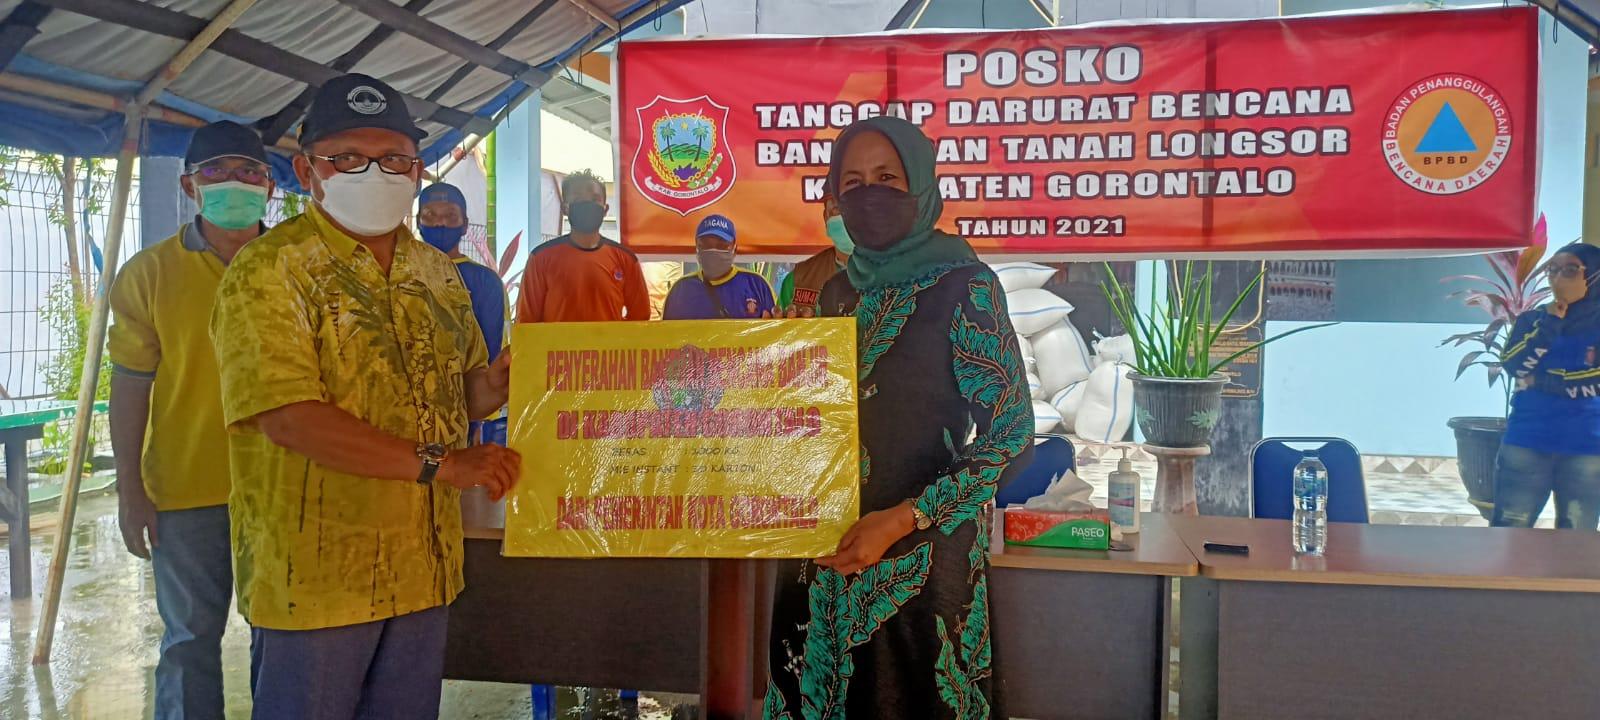 Pemkot Gorontalo Salurkan Bantuan Satu Ton Beras Untuk Korban Banjir di Kab. Gorontalo